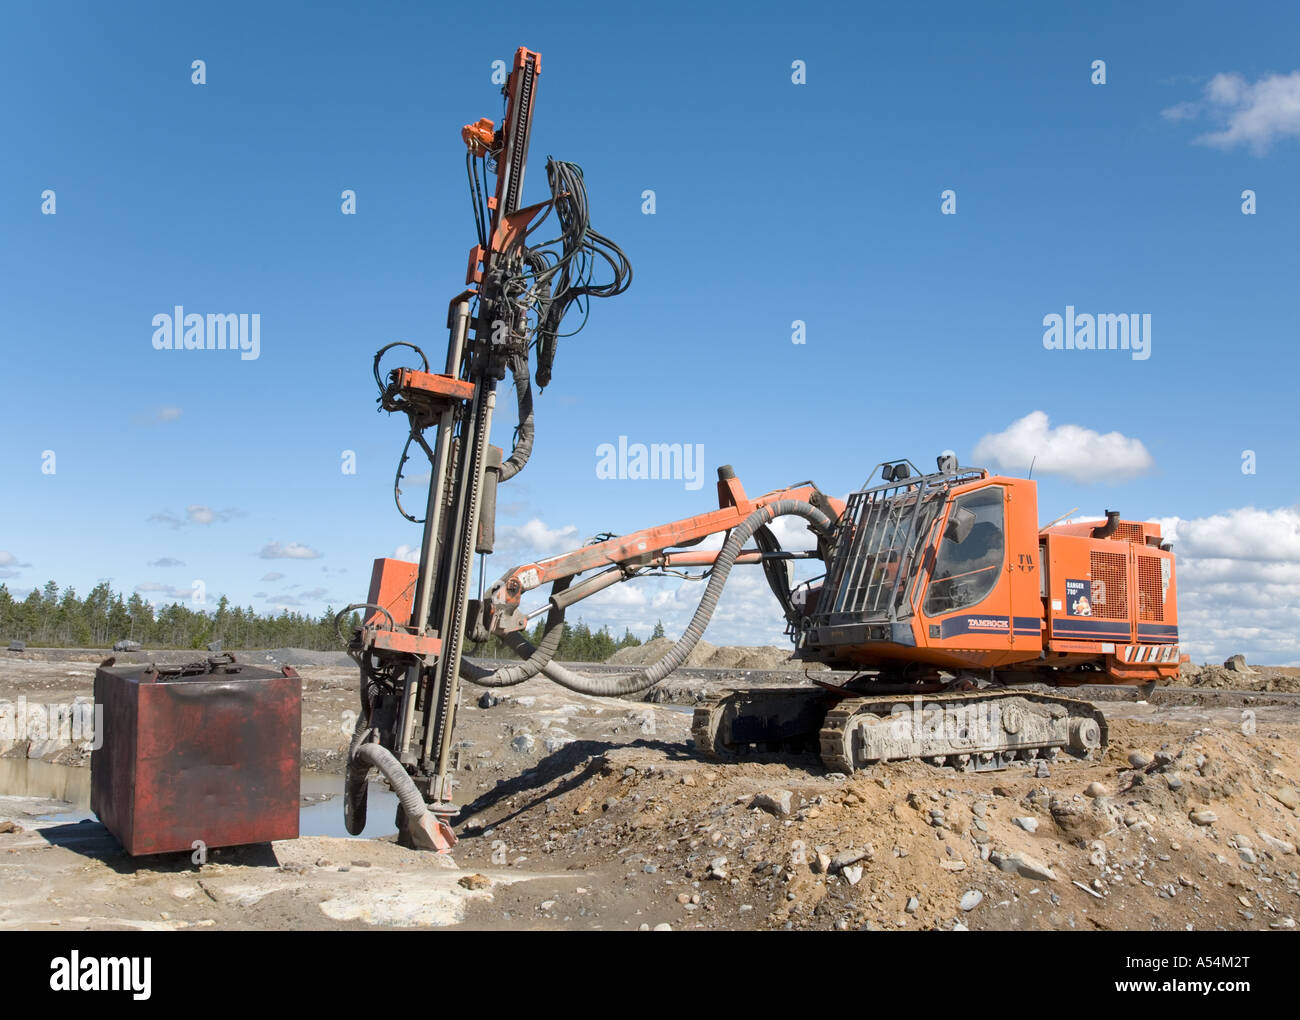 Orange Tamrock Ranger 780 rock drill machine in a rock